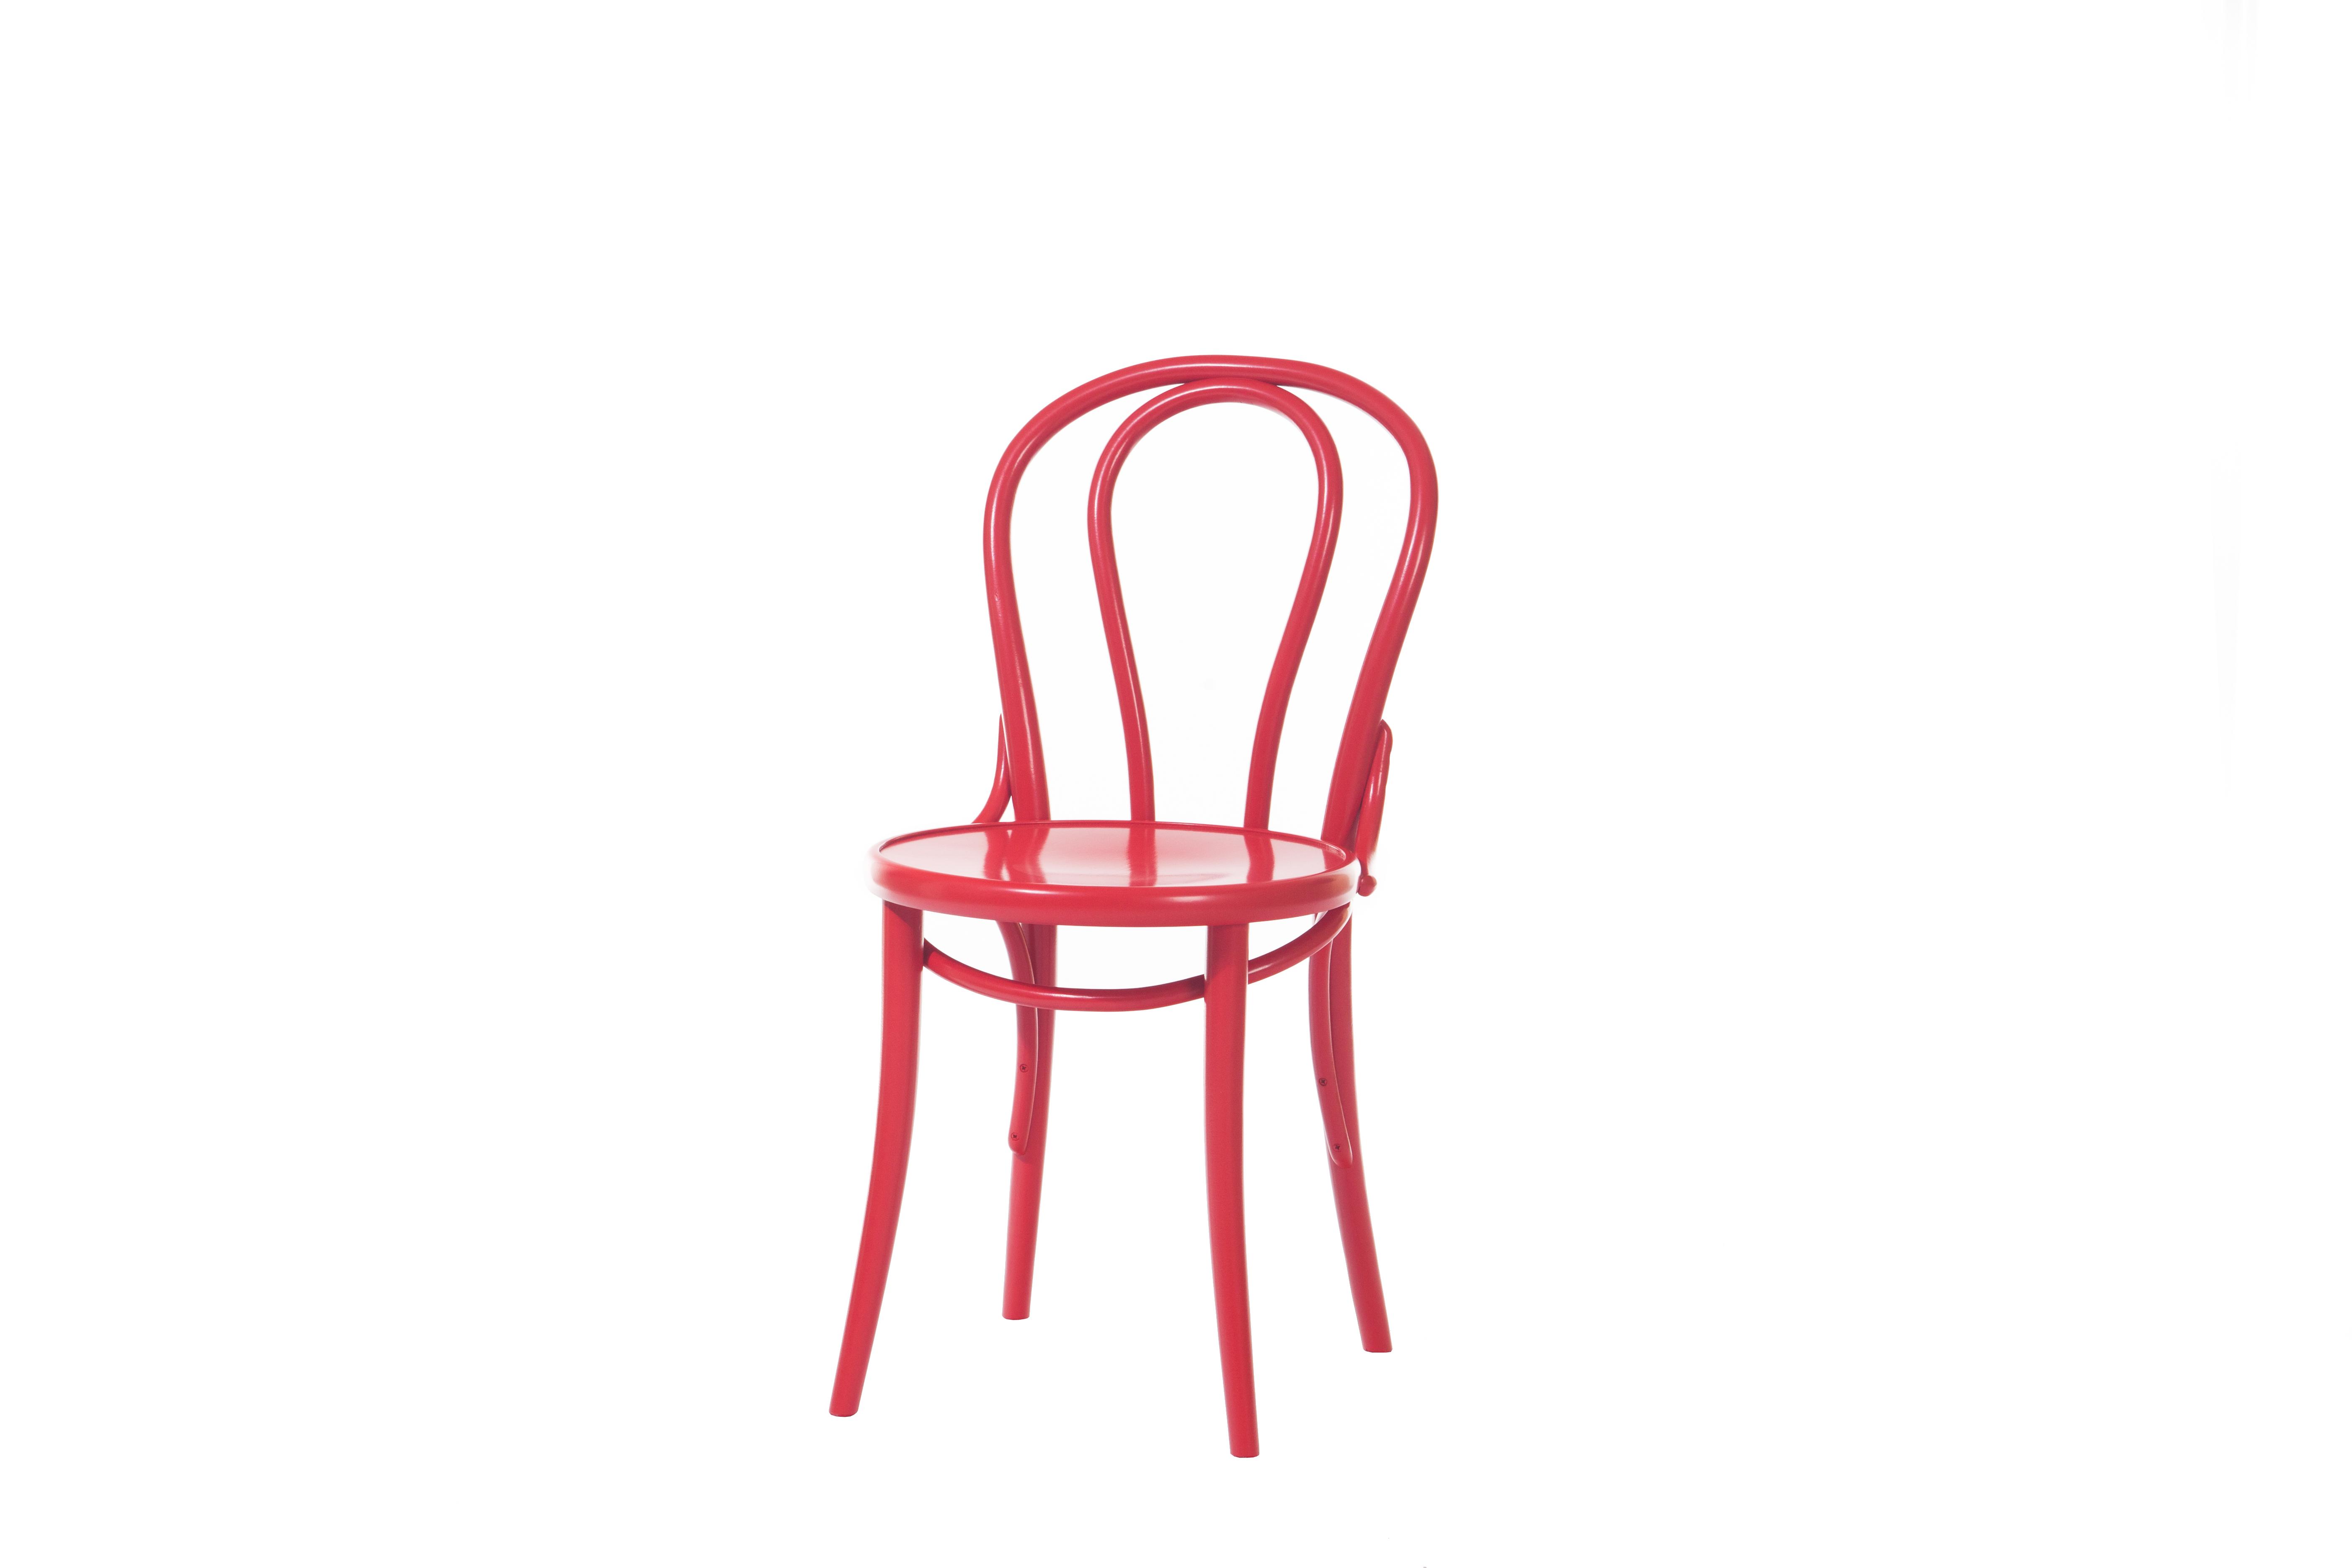 Scaun din lemn de fag 18 Red, l41xA51,5xH84 cm